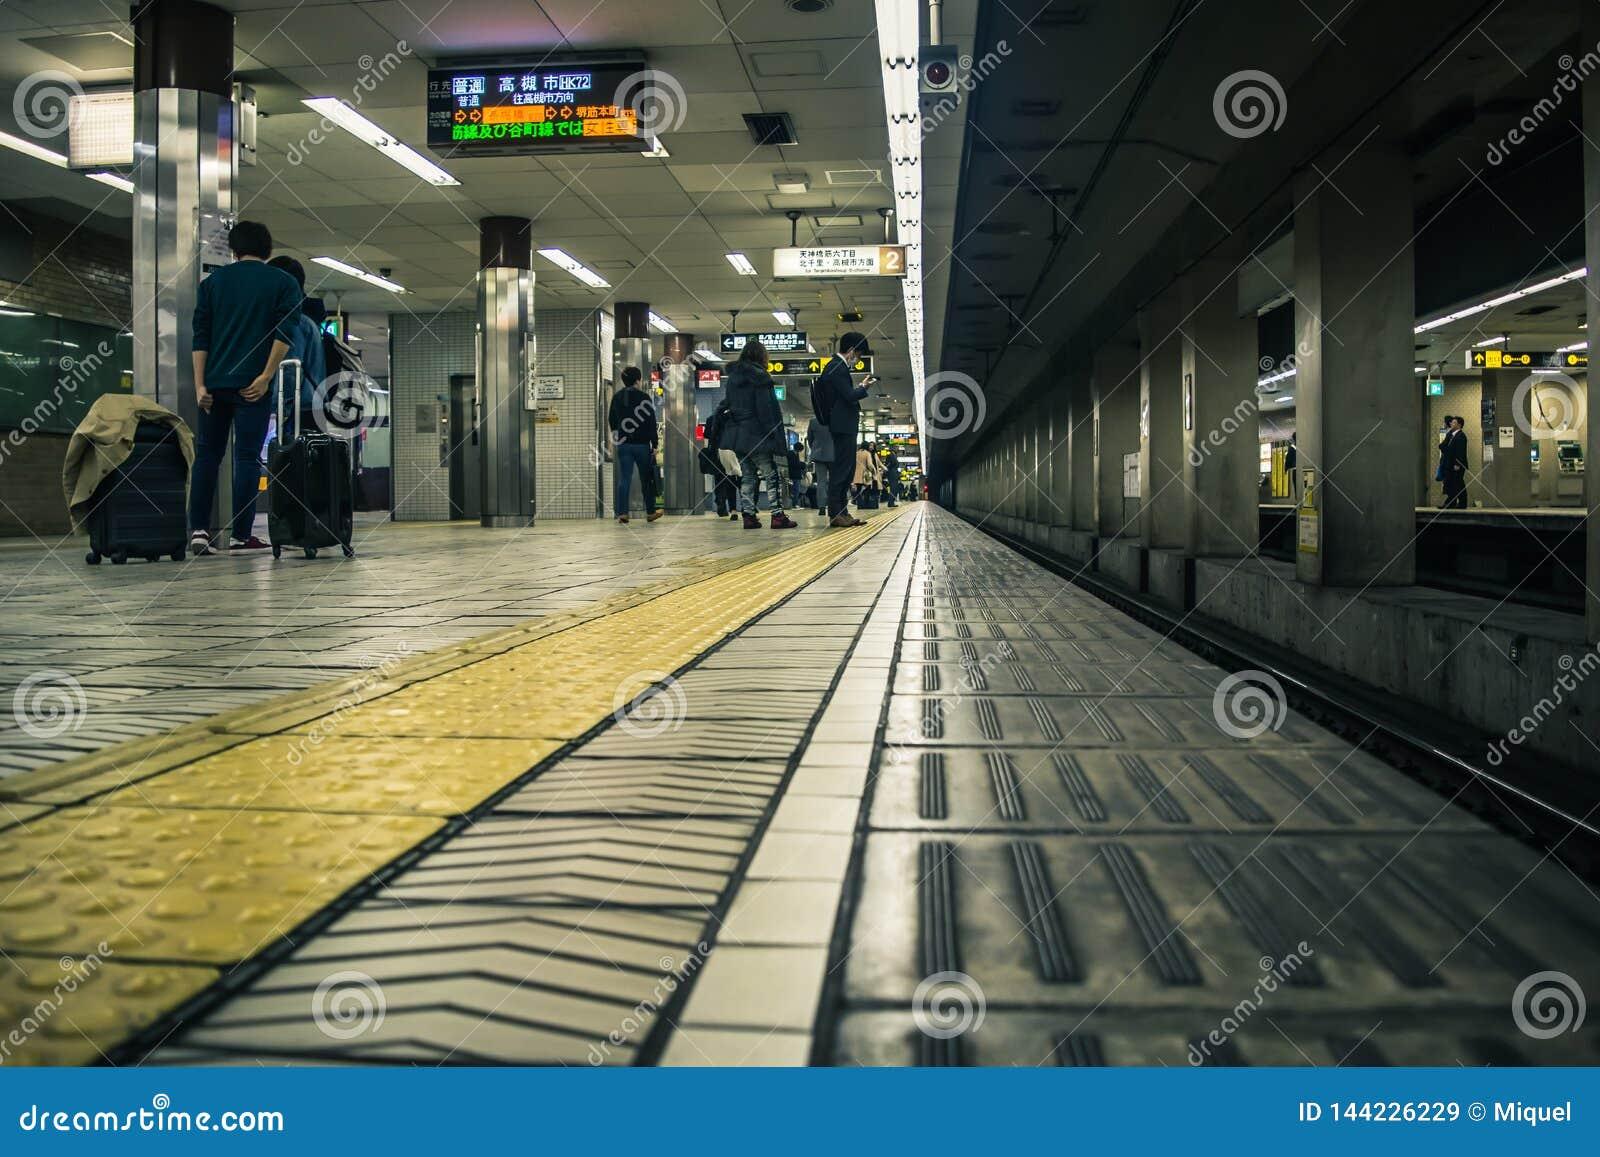 Subway station in Osaka, Japan